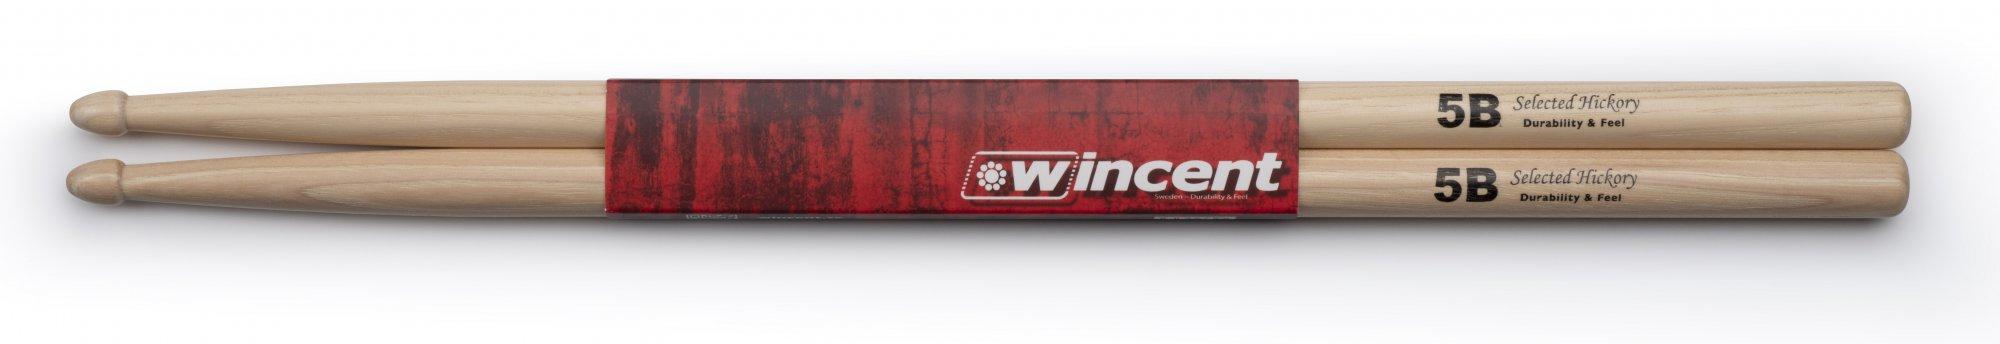 Wincent 5B Hickory Drumsticks